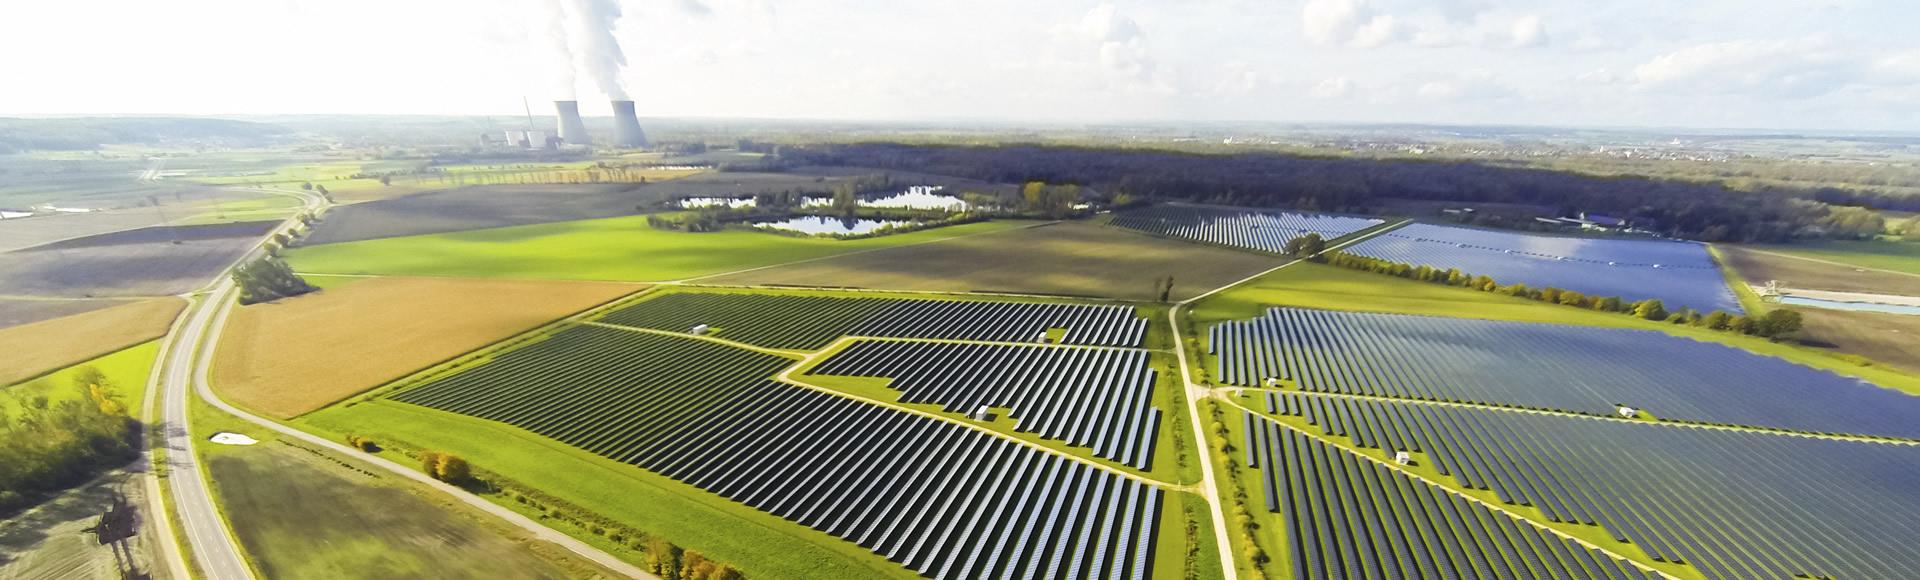 Mega-solar